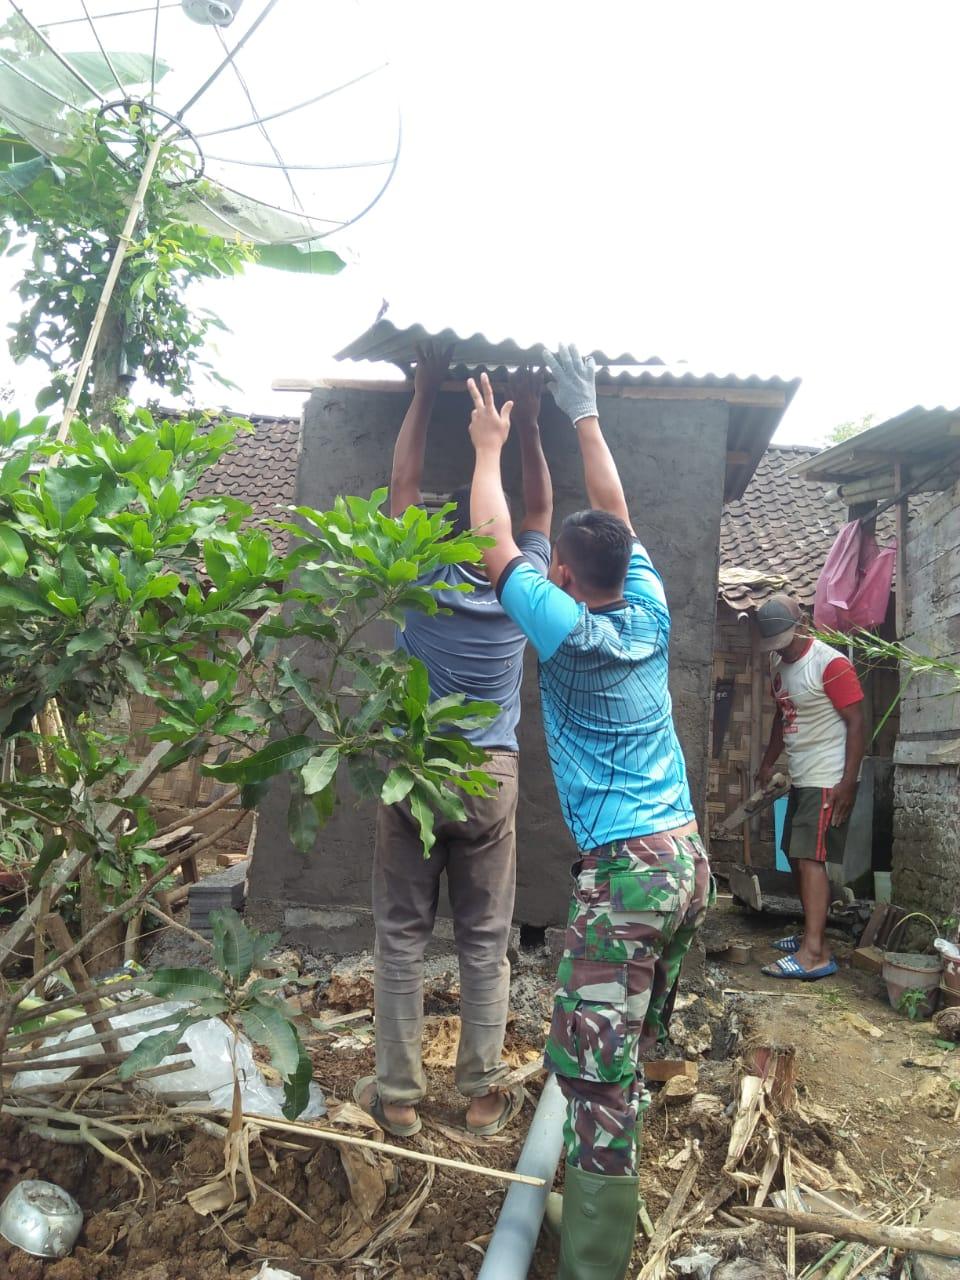 Rumah Sehat dan Bersih Berkat TMMD 106 Kodim Malang